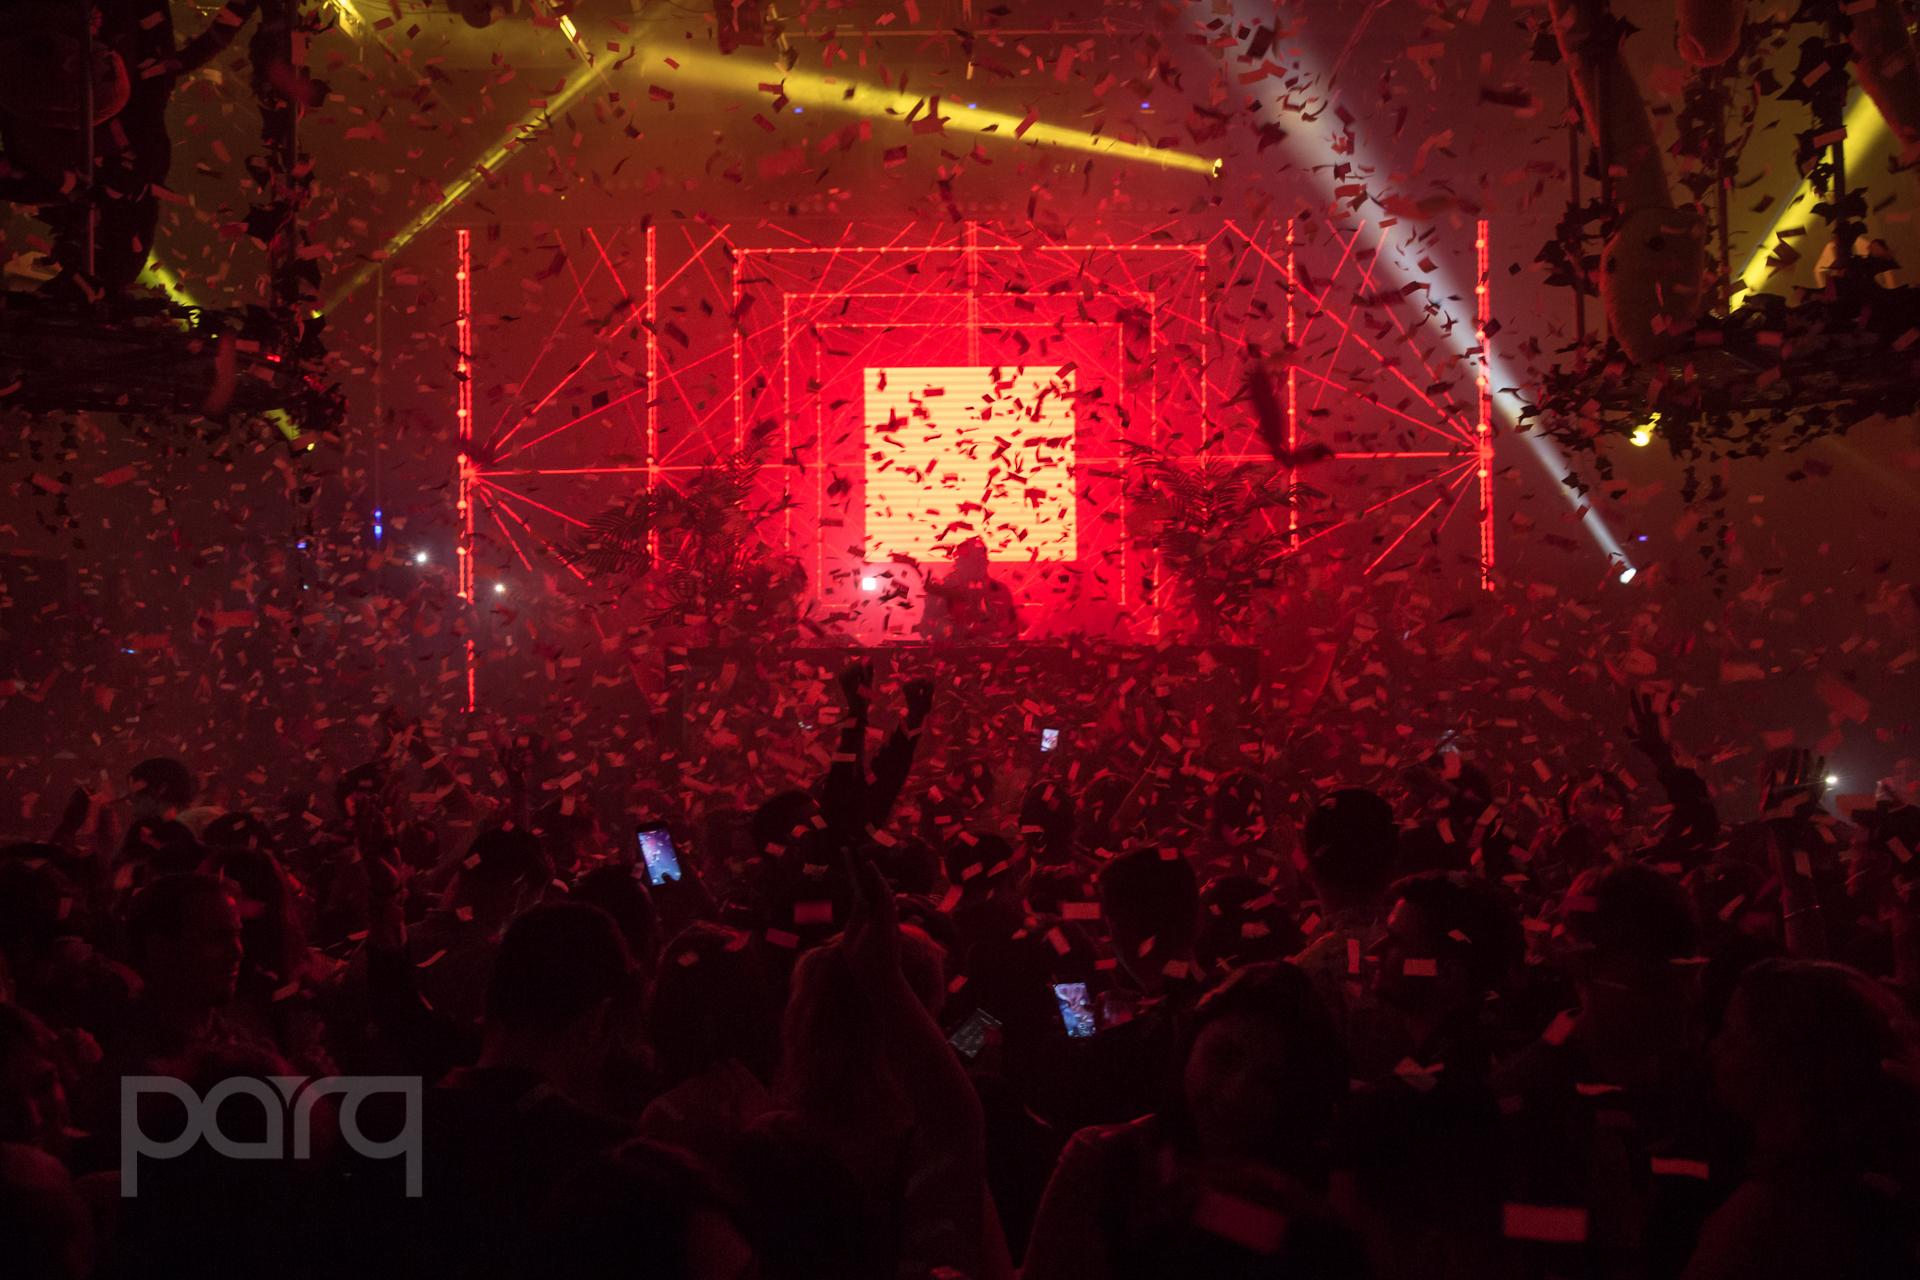 San-Diego-Nightclub-Zoo Funktion-39.jpg